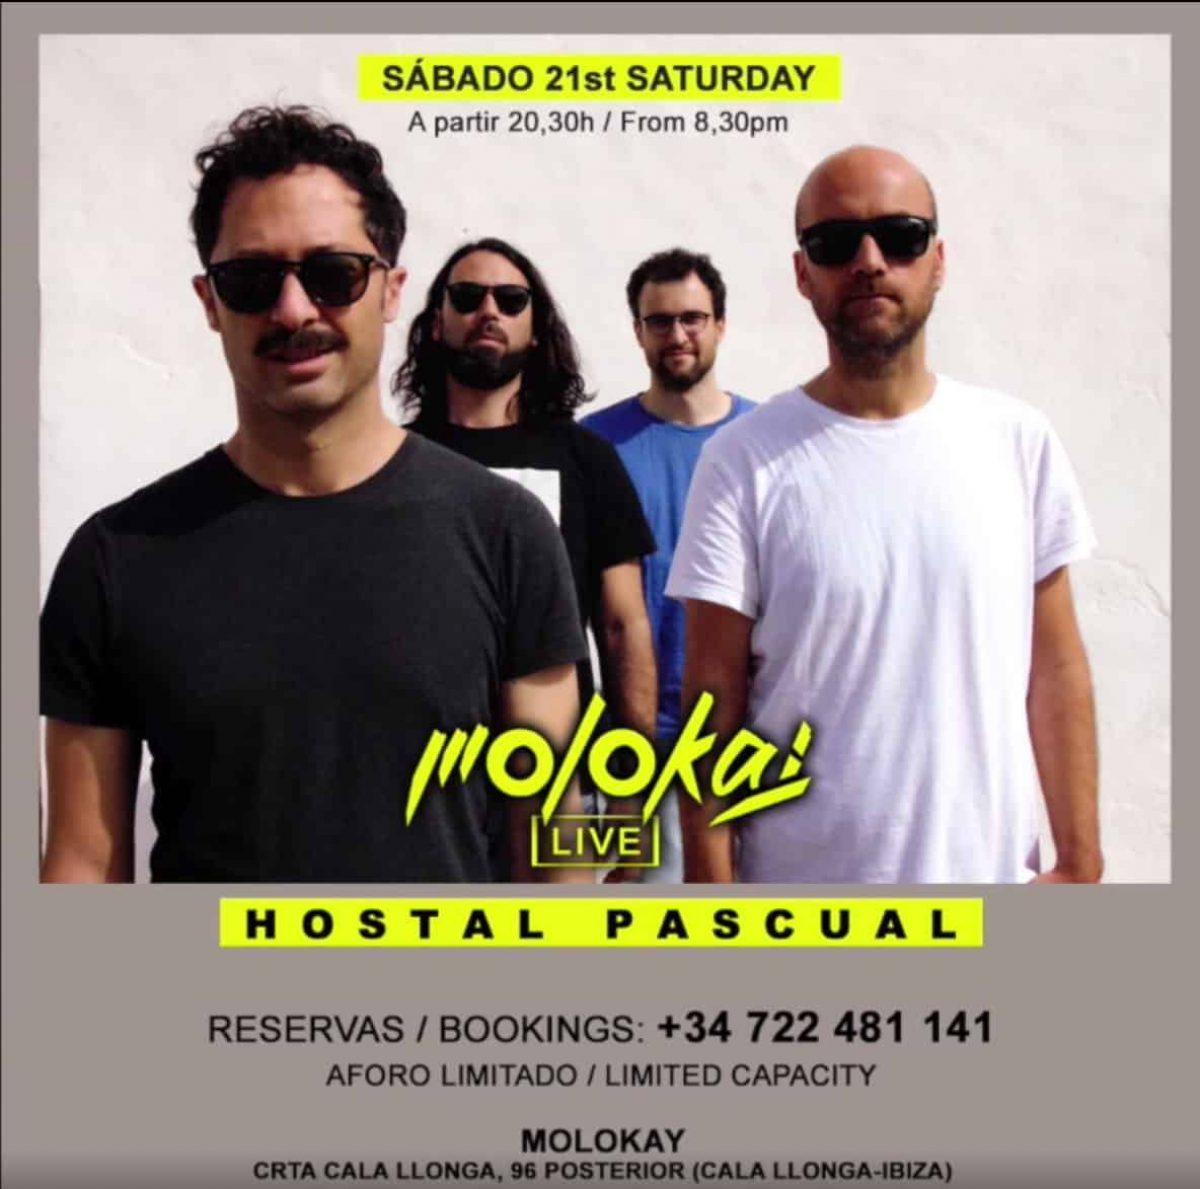 molokay-ibiza-hostal-pascual-2021-welcometoibiza